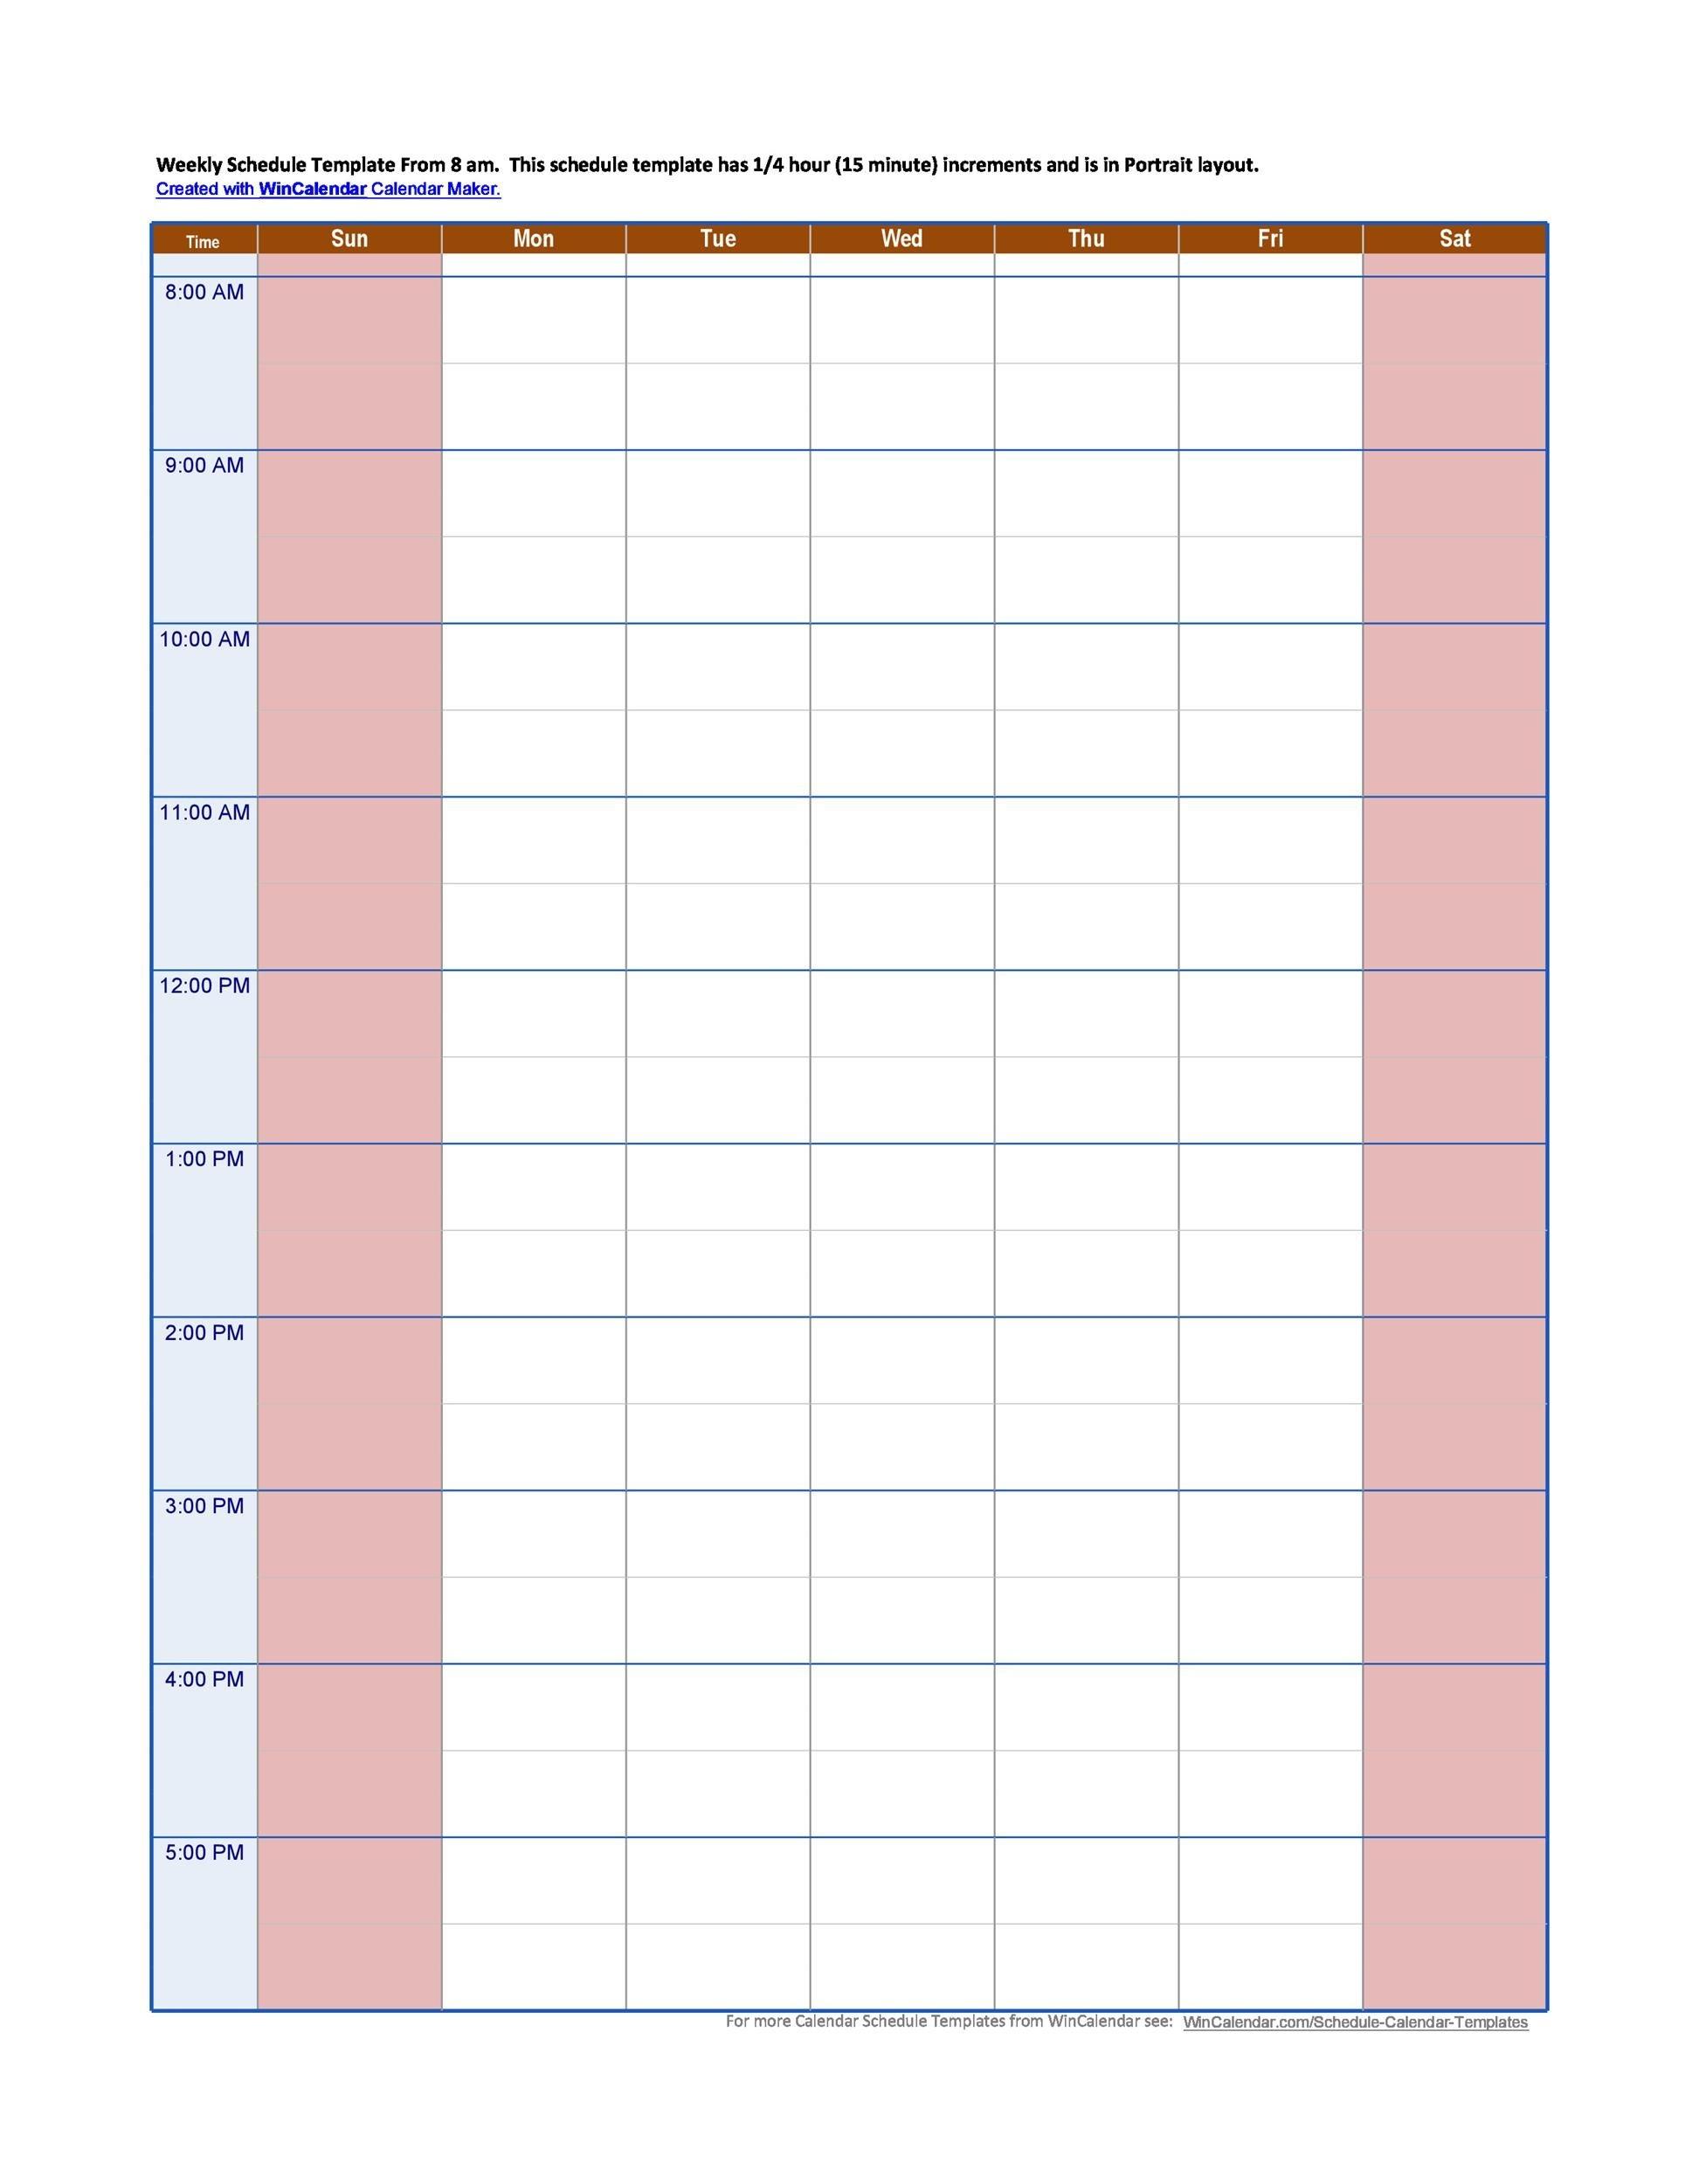 43 Effective Hourly Schedule Templates (Excel & Ms Word) ᐅ